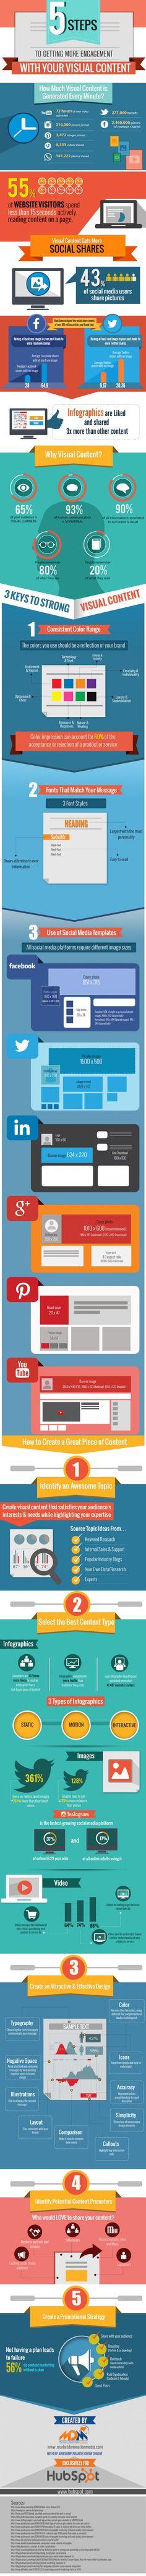 visueller-content-infografik  http://t3n.de/news/visueller-content-602576/